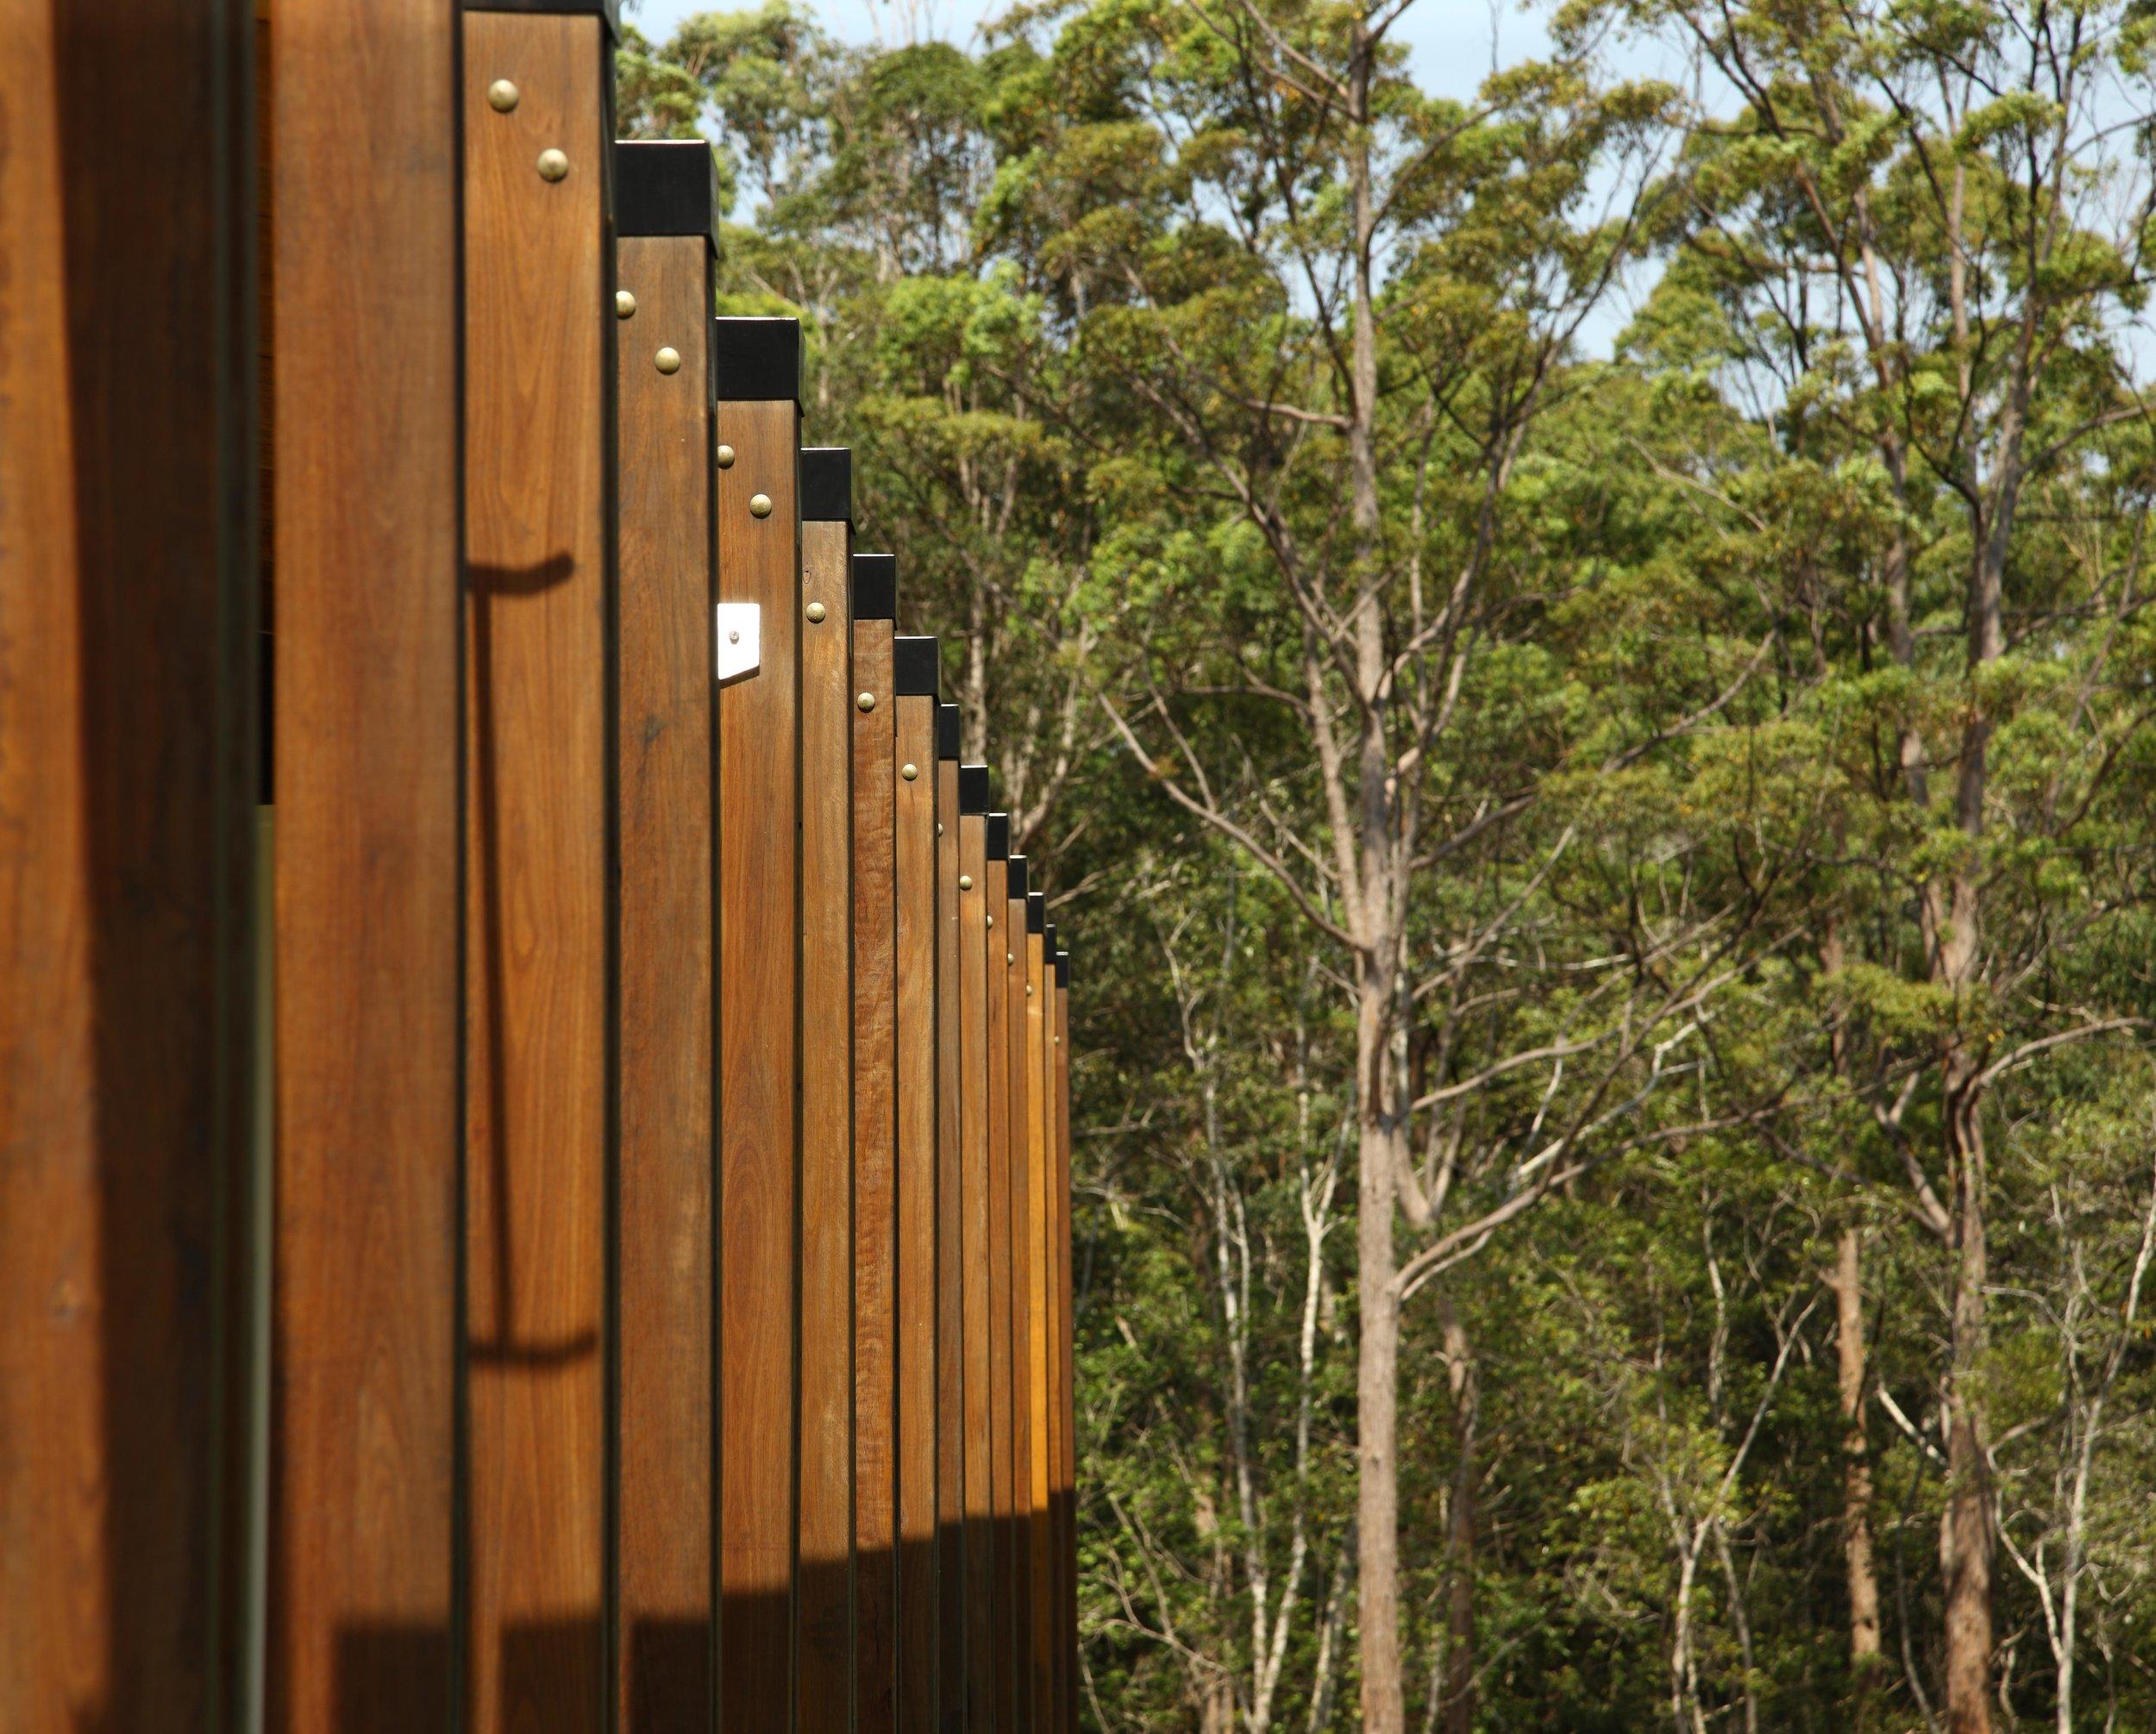 Maroochy-Botanic-Gardens-Guymer-Bailey-Landscape-11.jpg